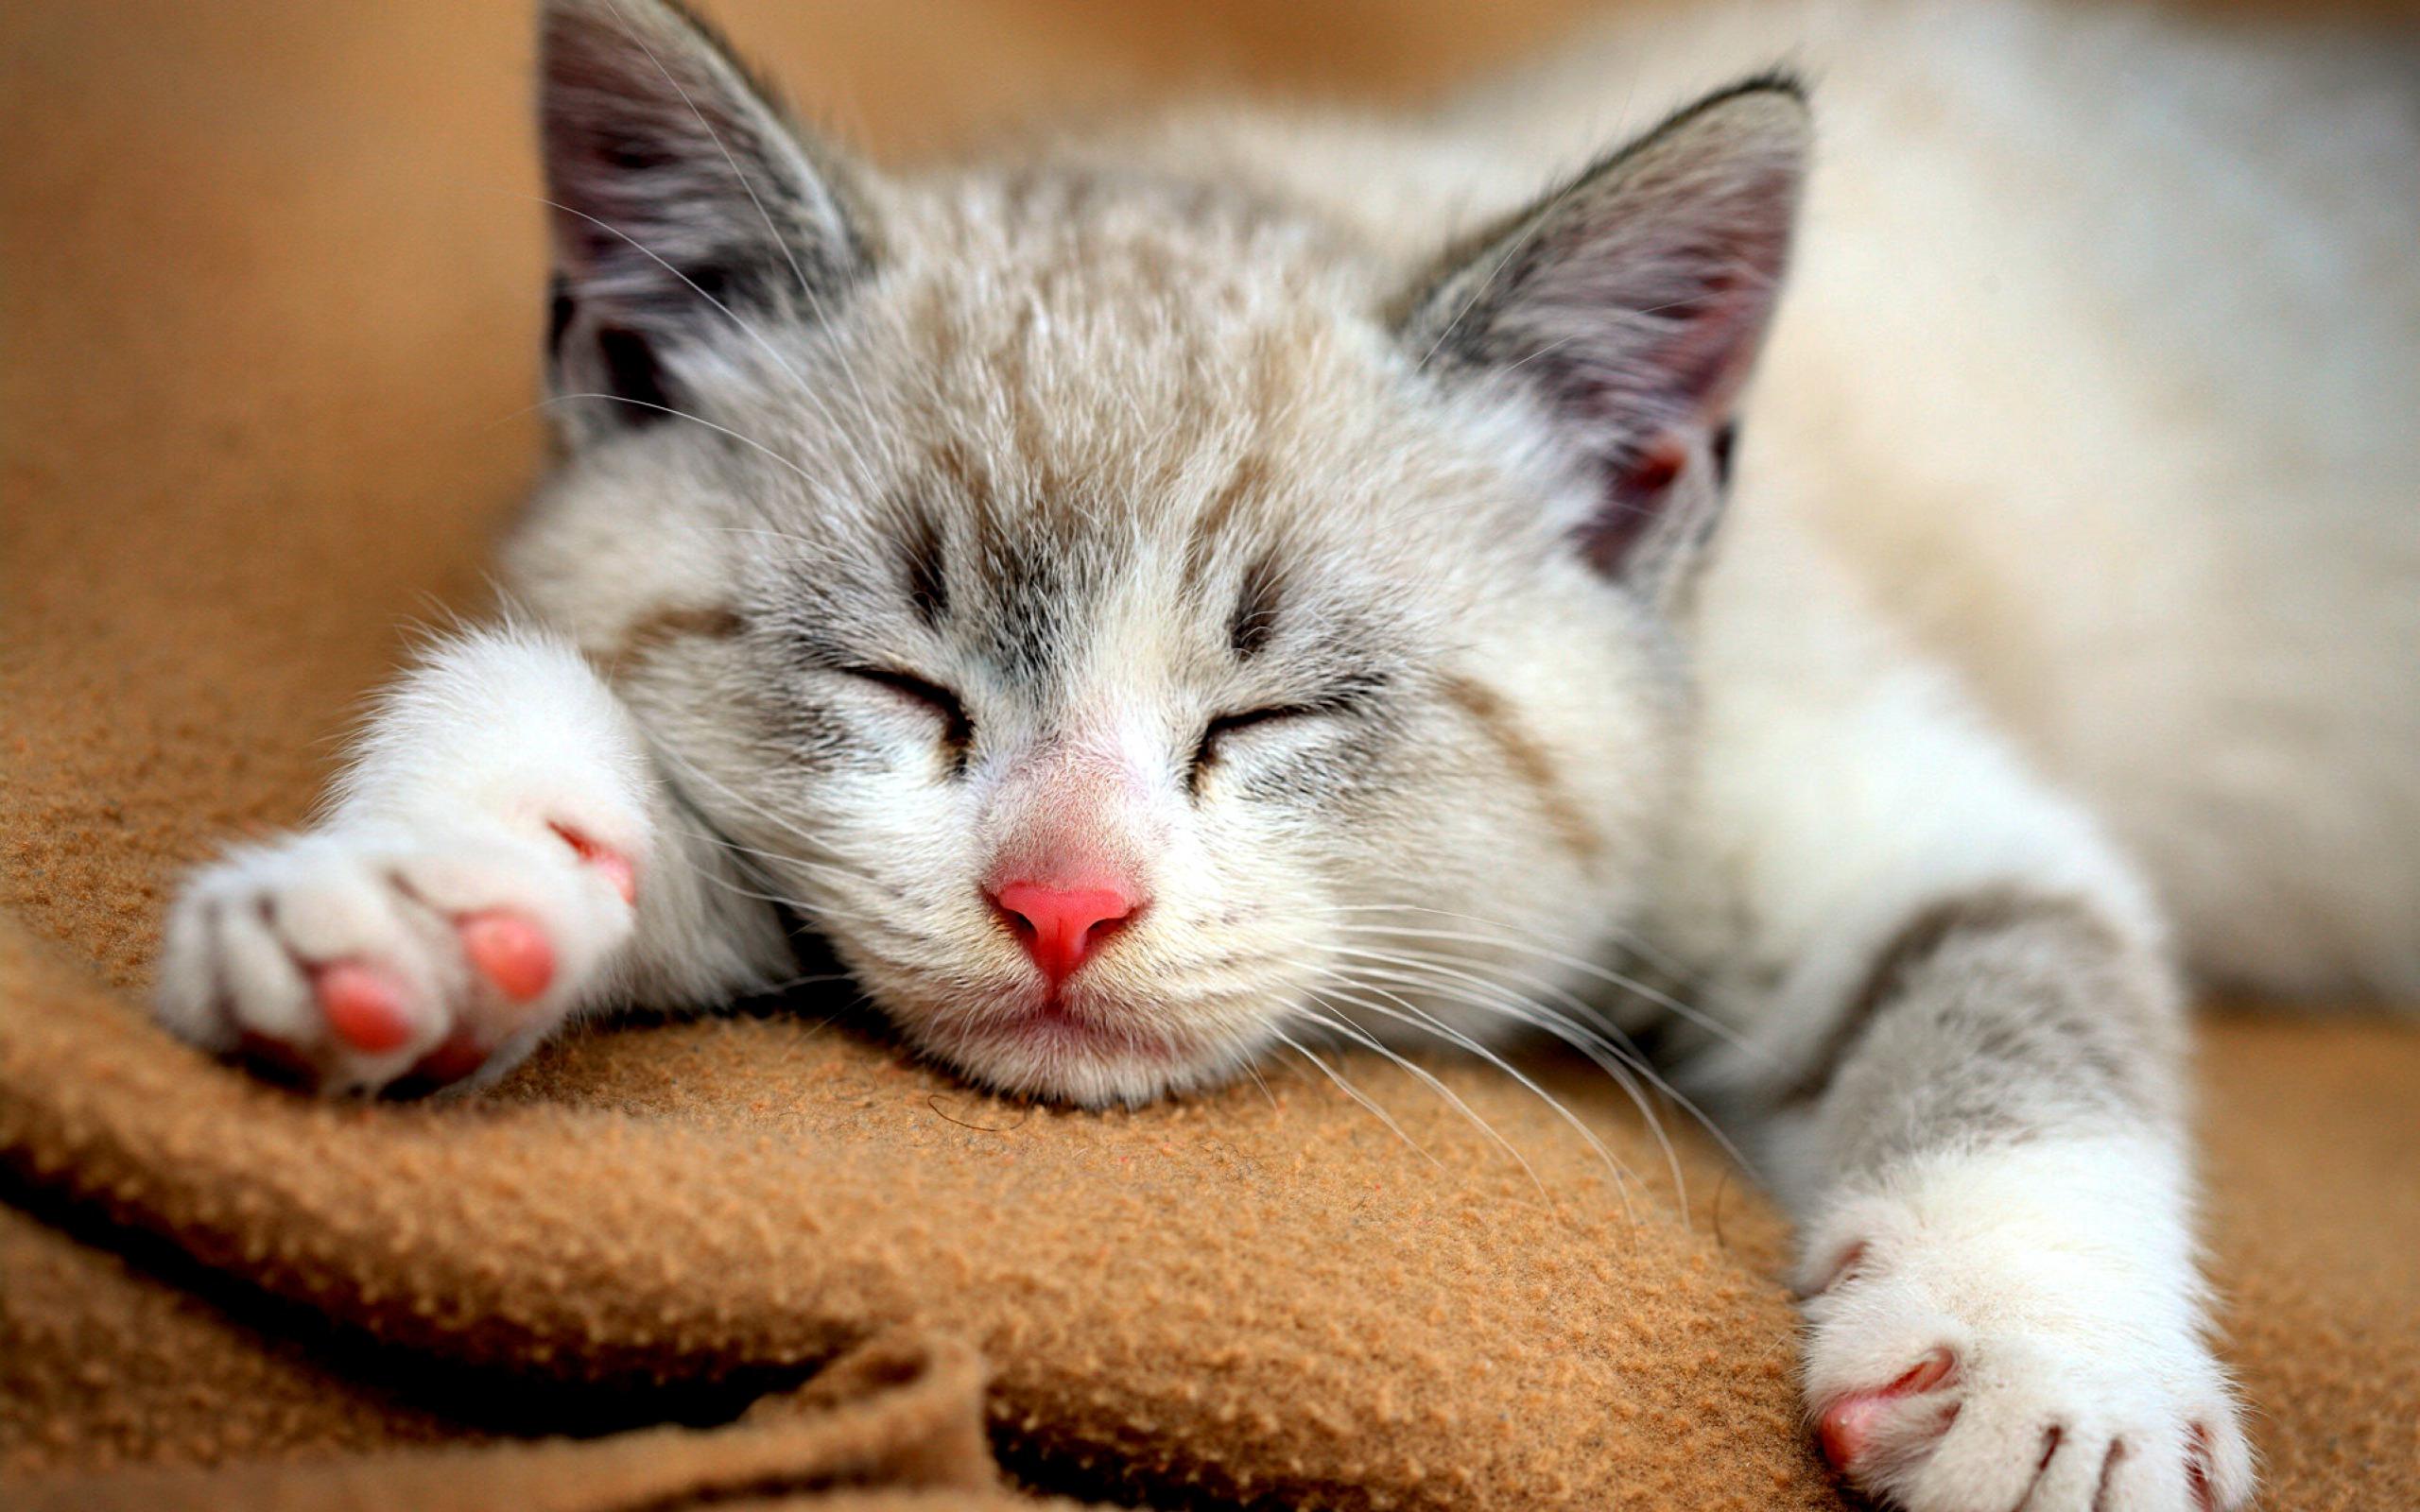 Cute Baby Cats Wallpaper Hd Desktop Wallpapers 4k Hd